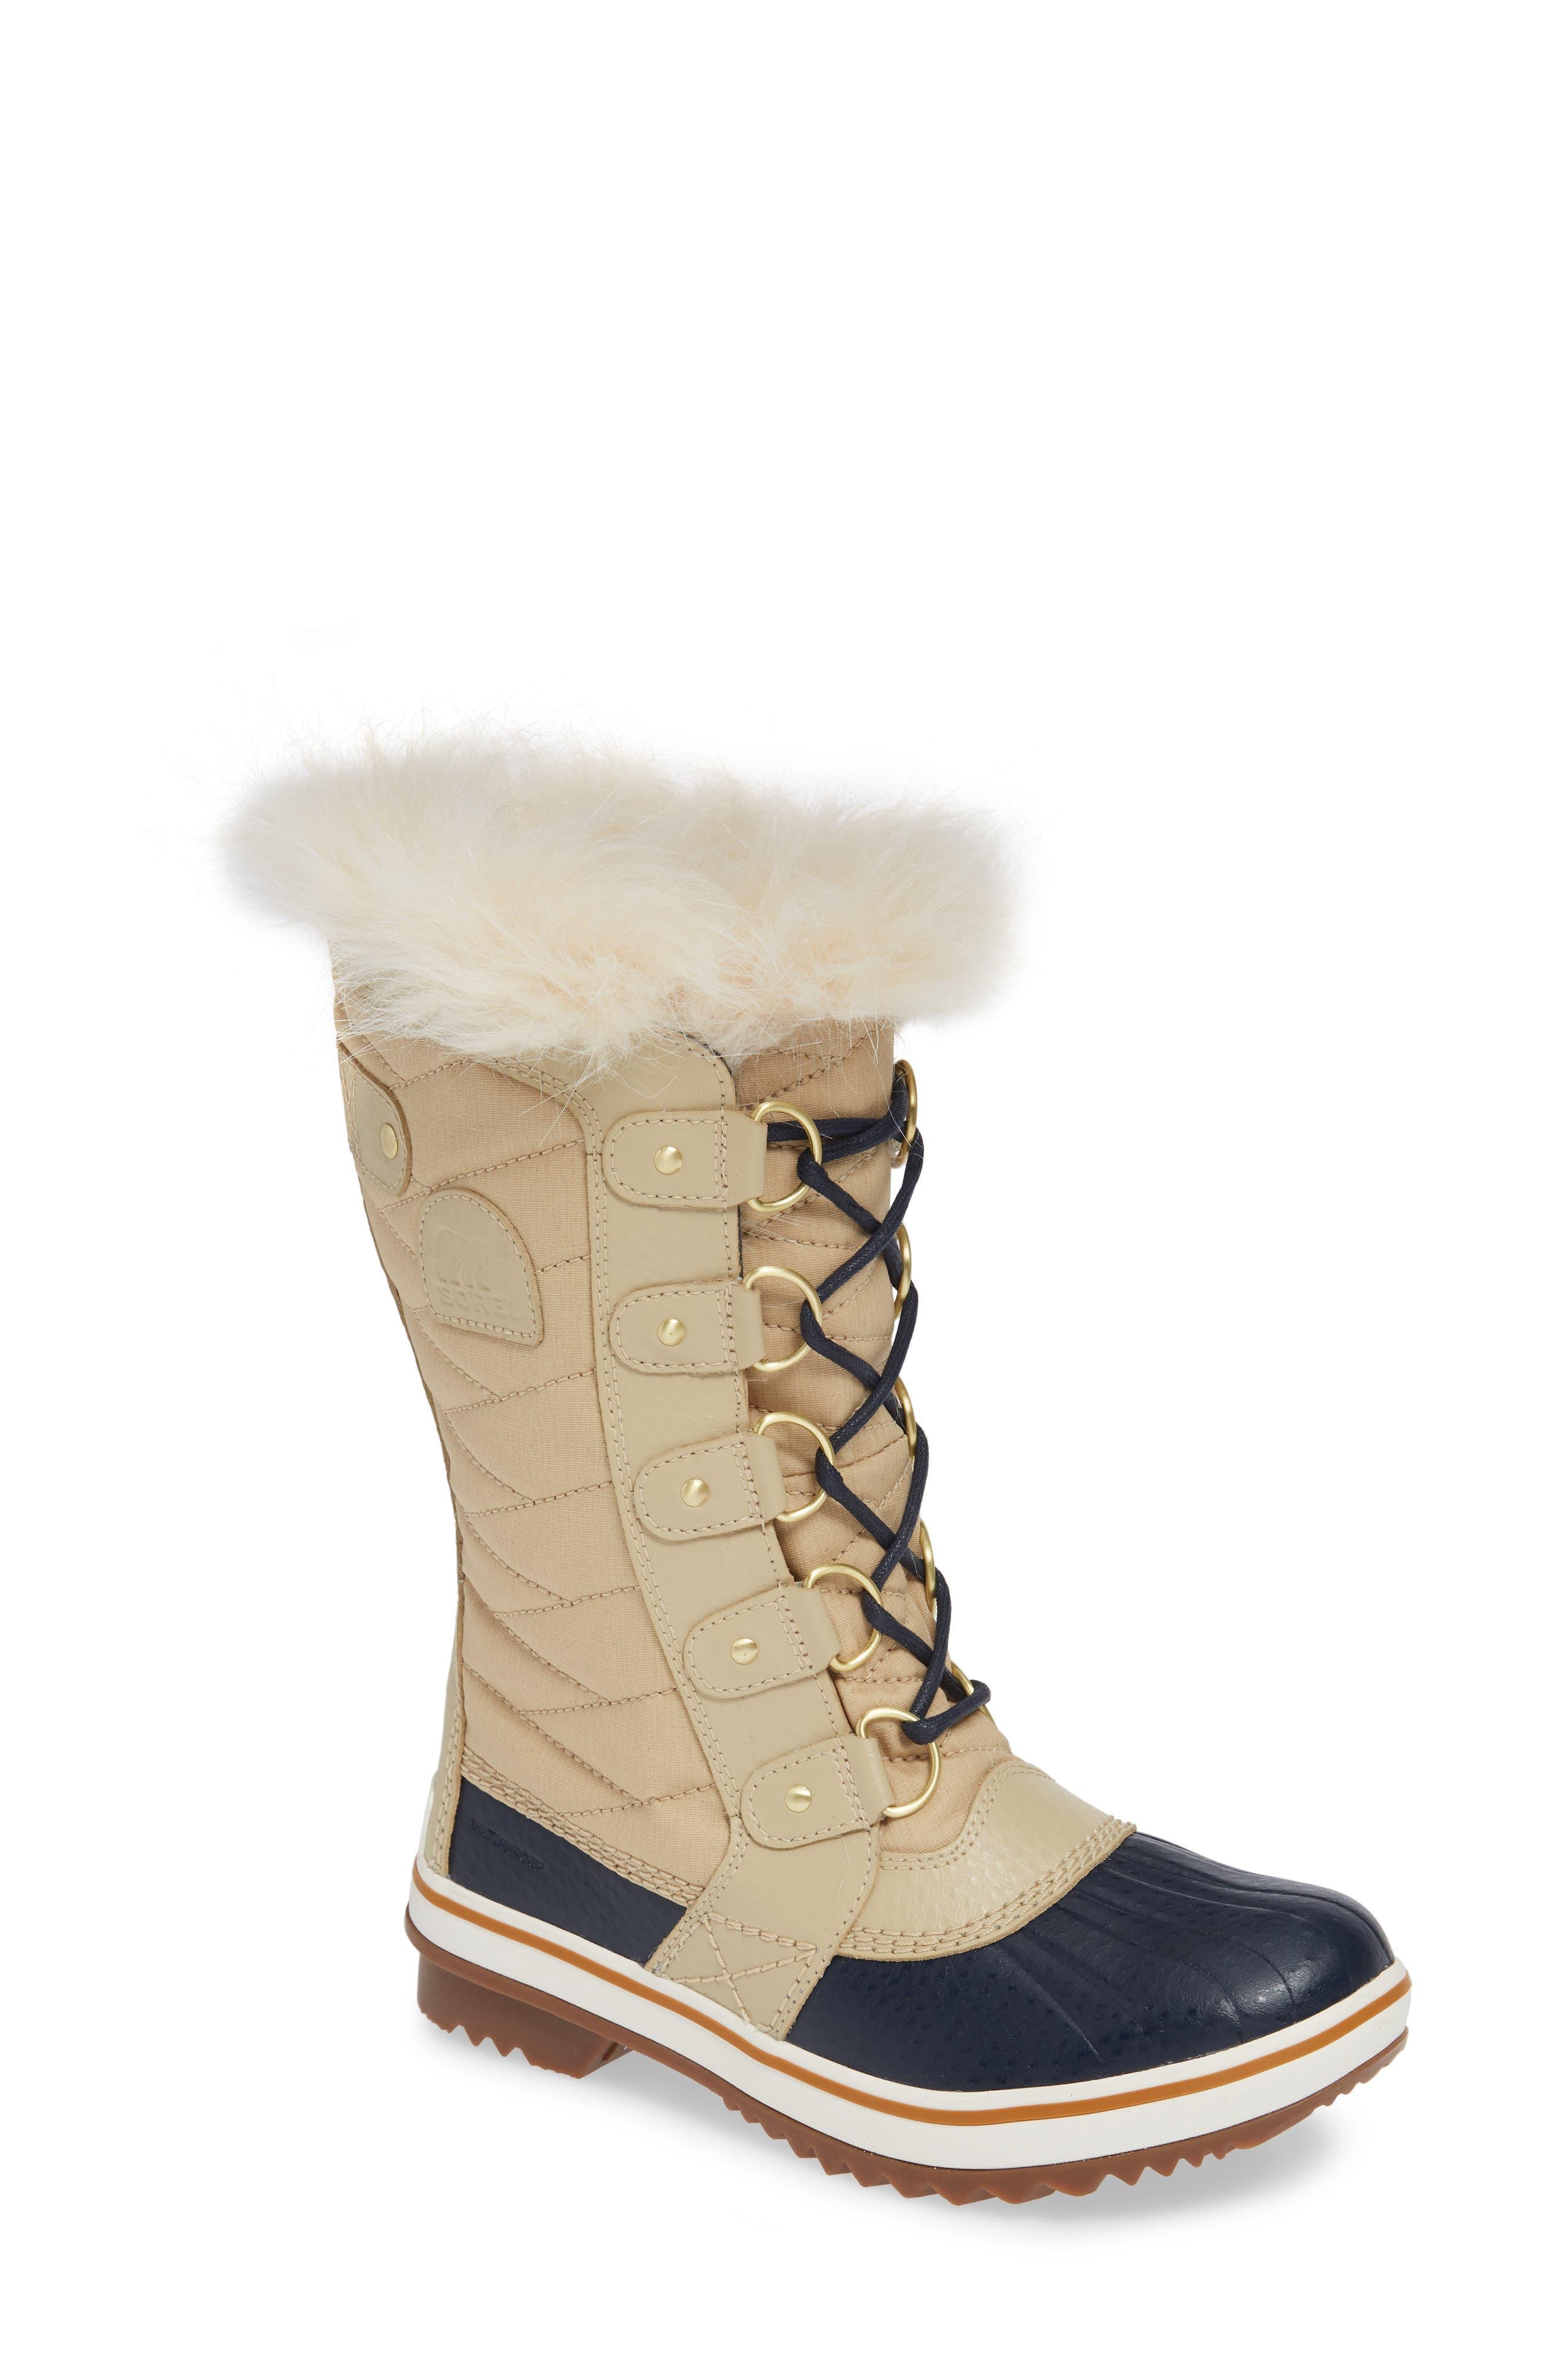 e3ec4e2710d8 Sorel  Tofino Ii  Faux Fur Lined Waterproof Boot